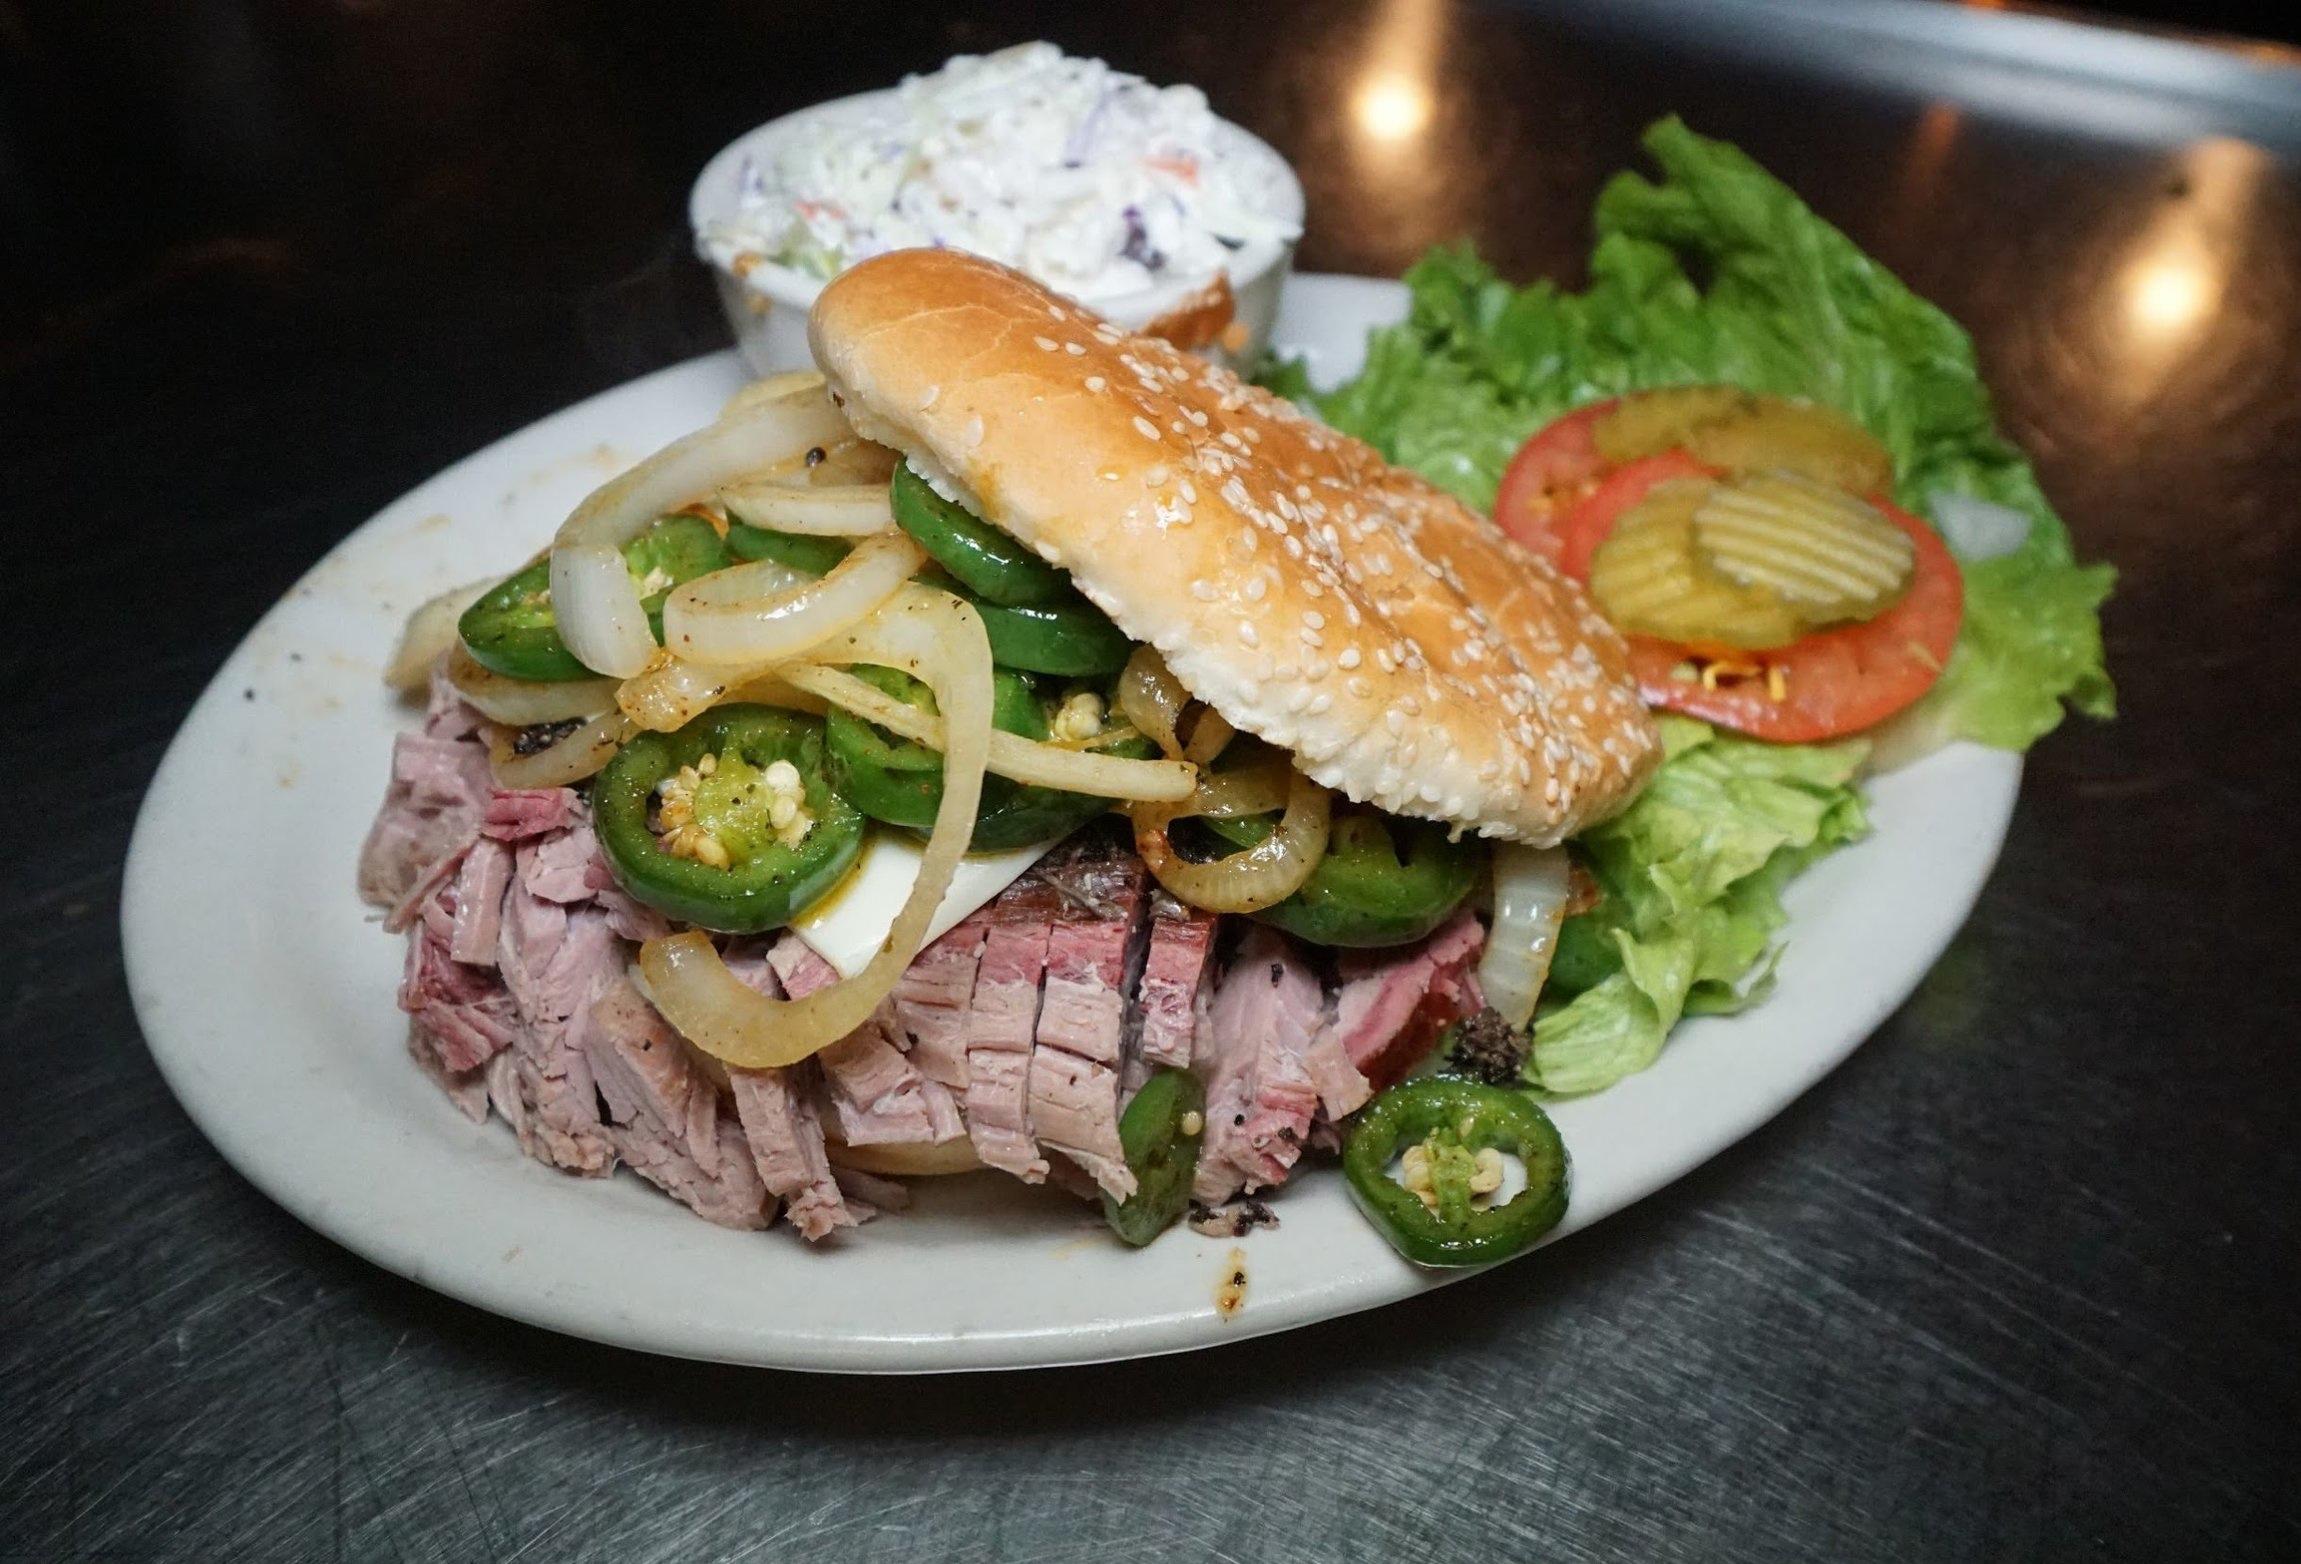 Rib hut El Paso brisket sandwich